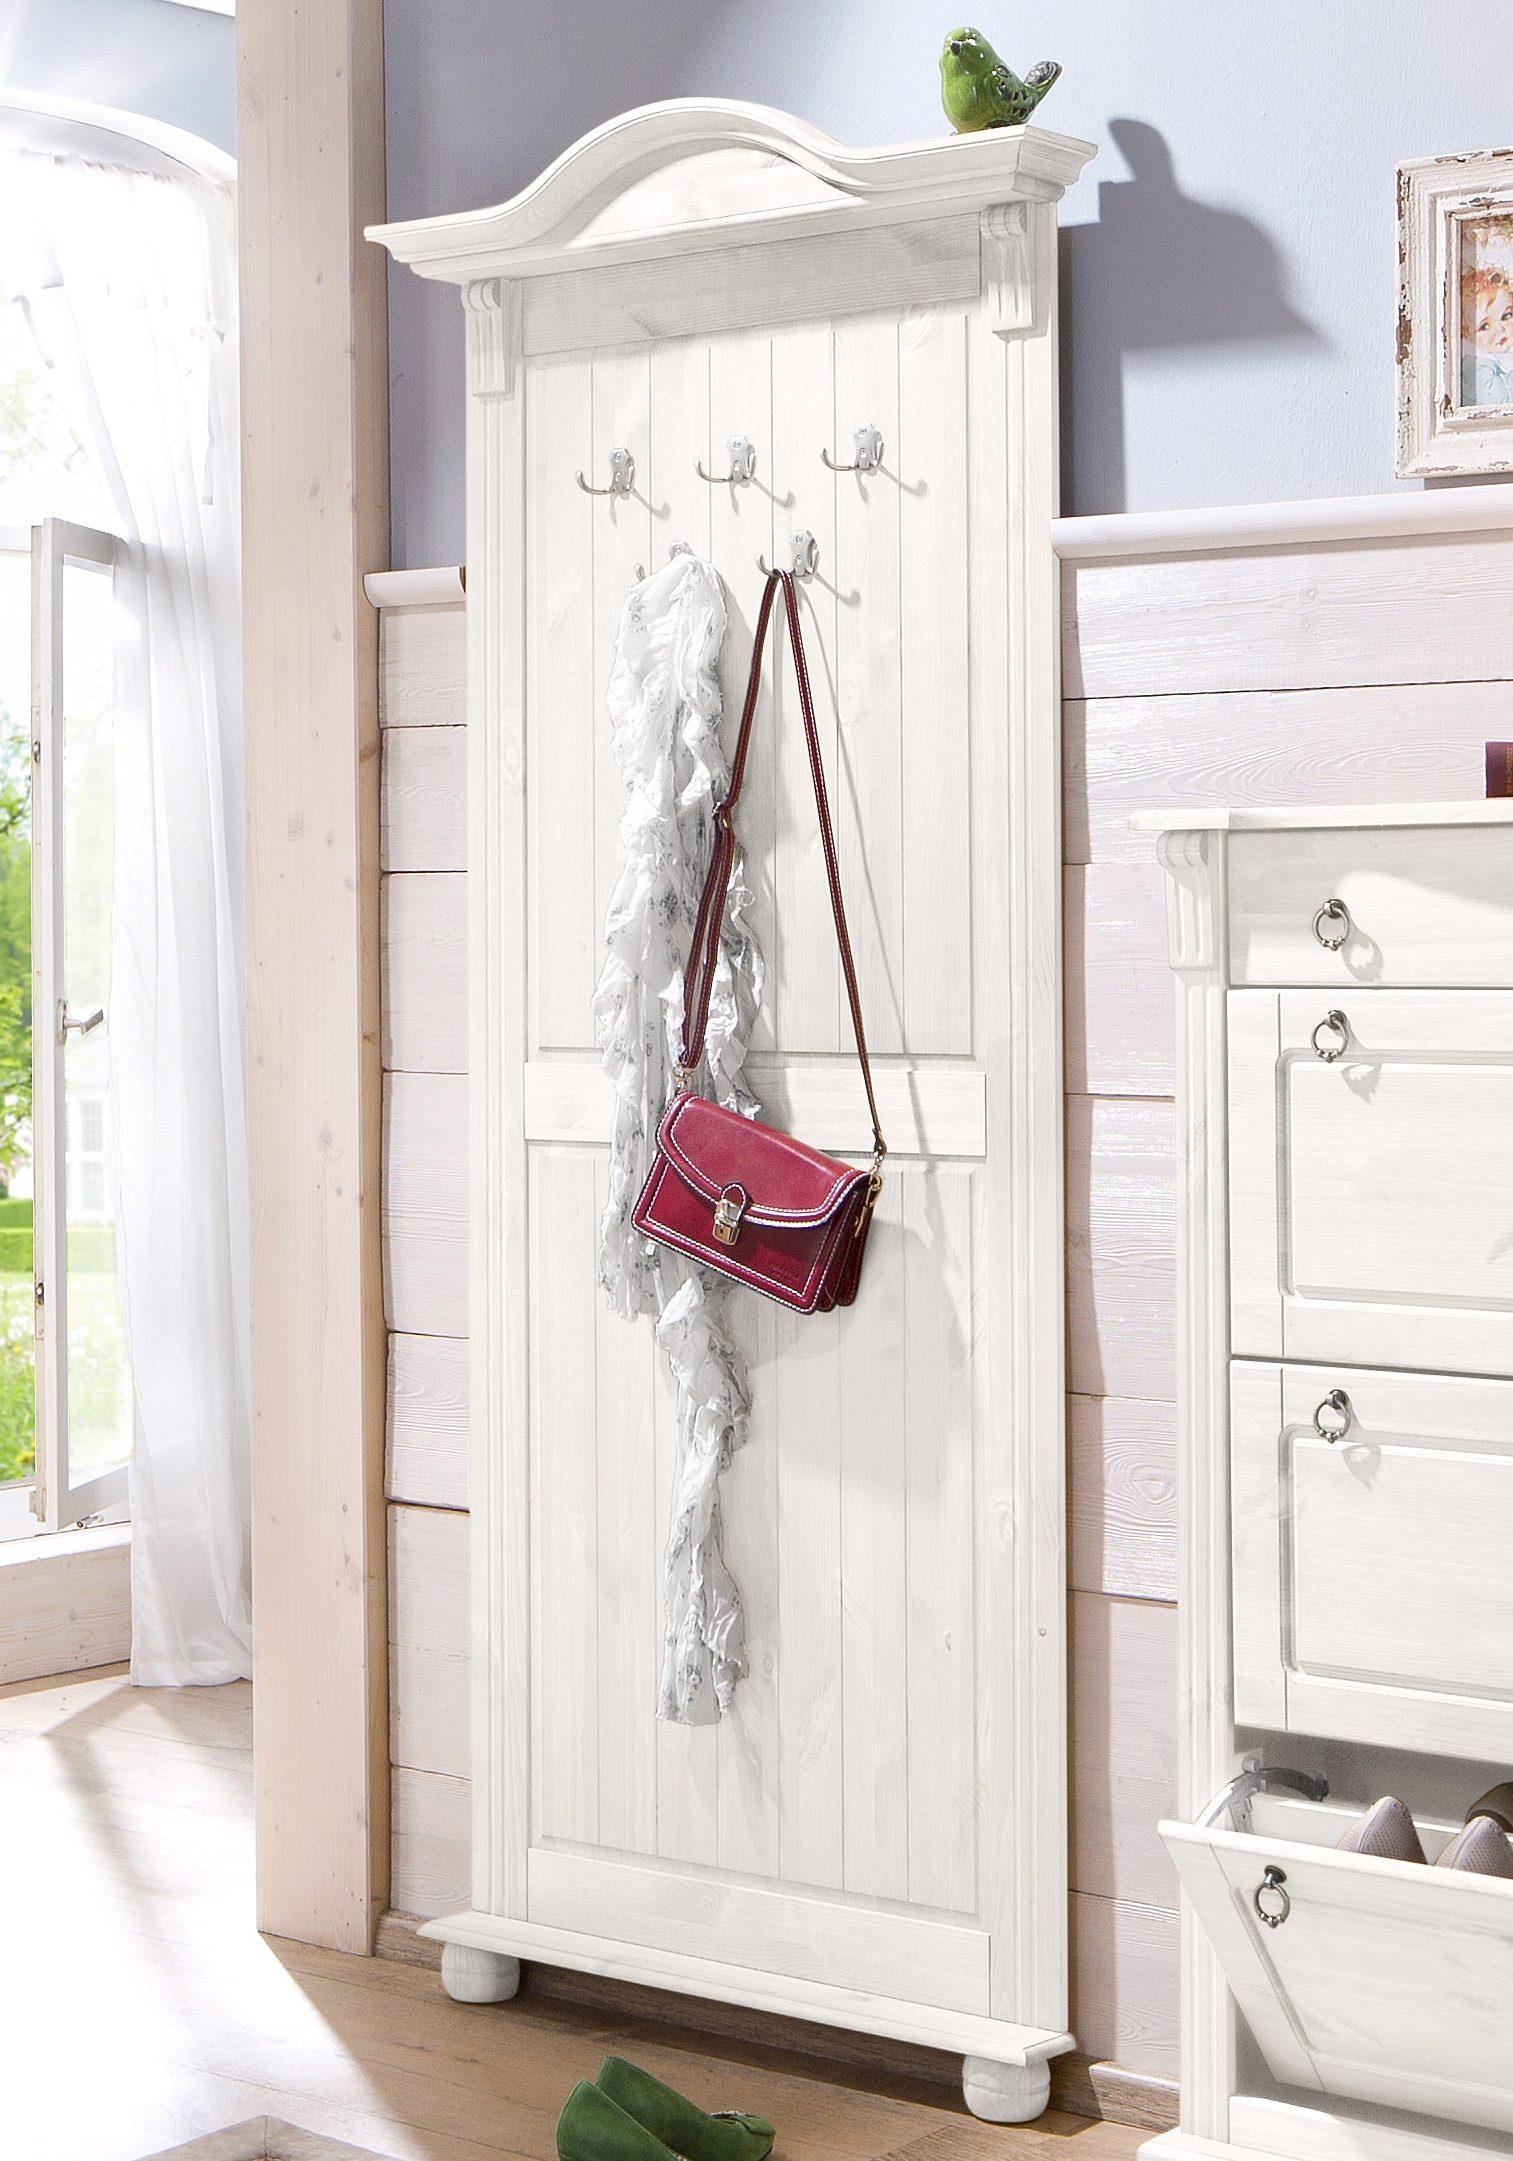 home affaire garderobe florenz defactodeal. Black Bedroom Furniture Sets. Home Design Ideas